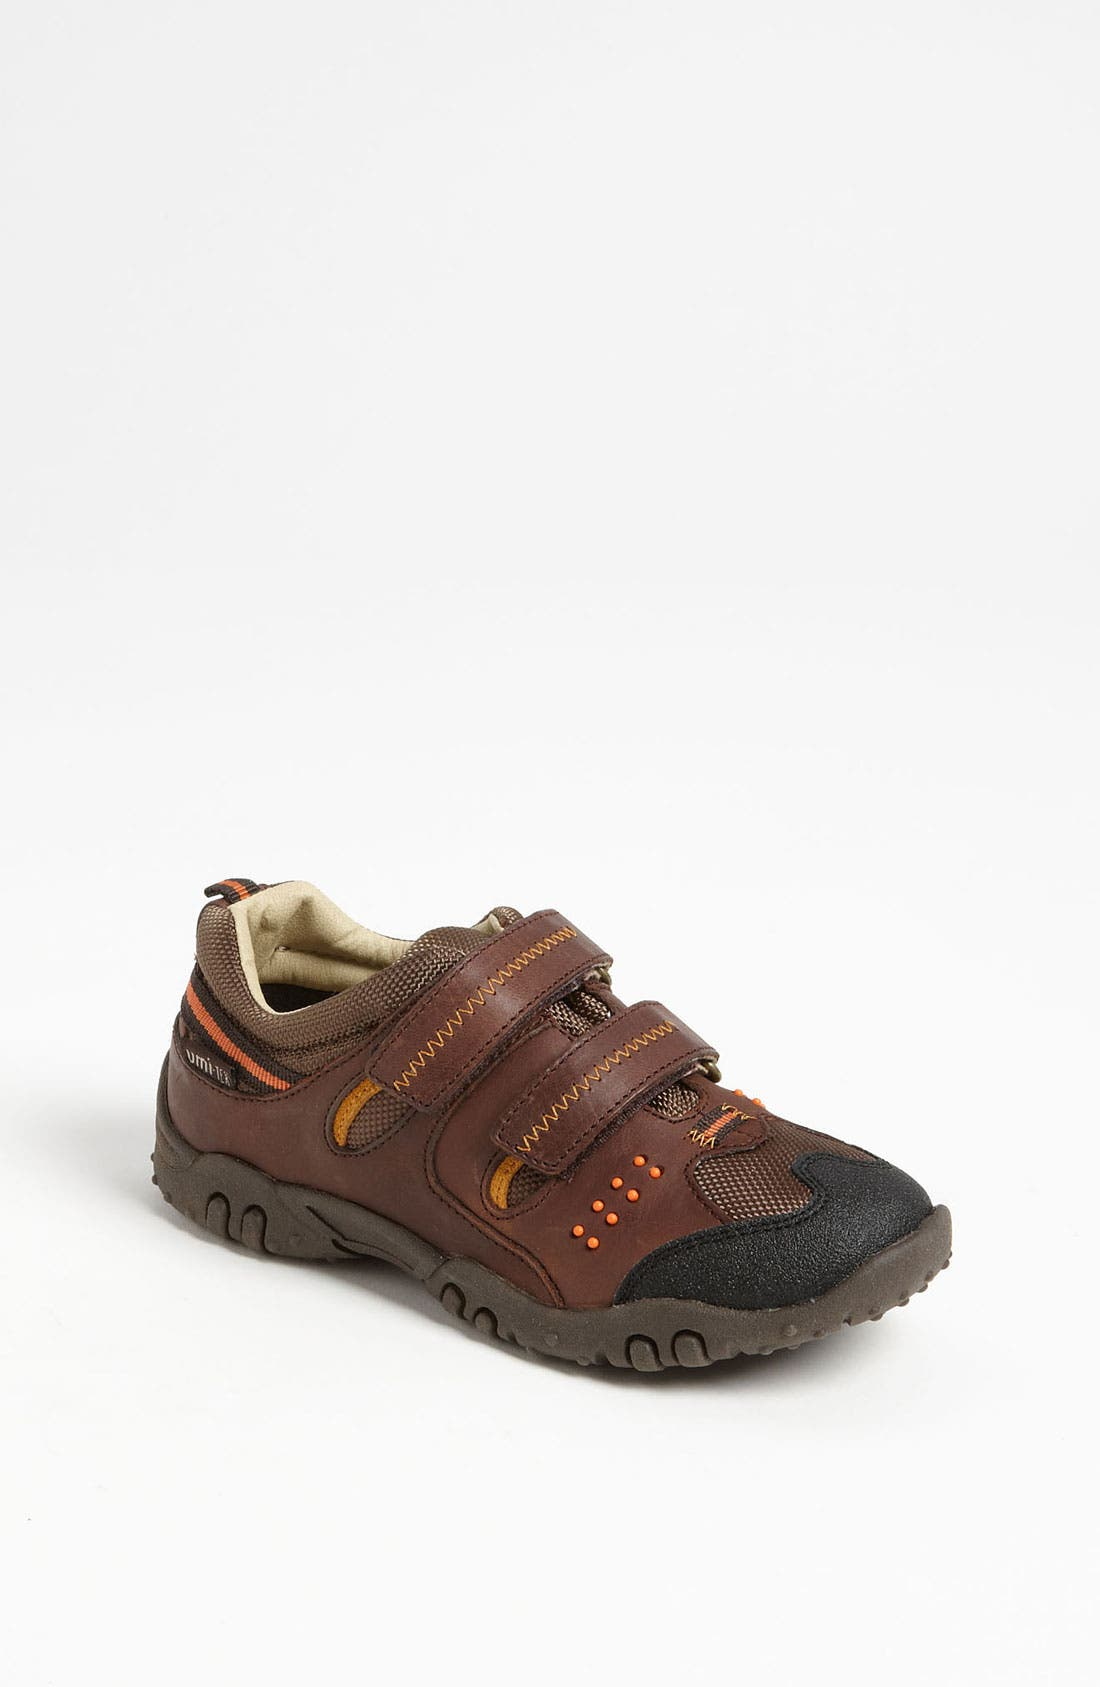 Main Image - Umi 'Hayman' Sneaker (Toddler, Little Kid & Big Kid)